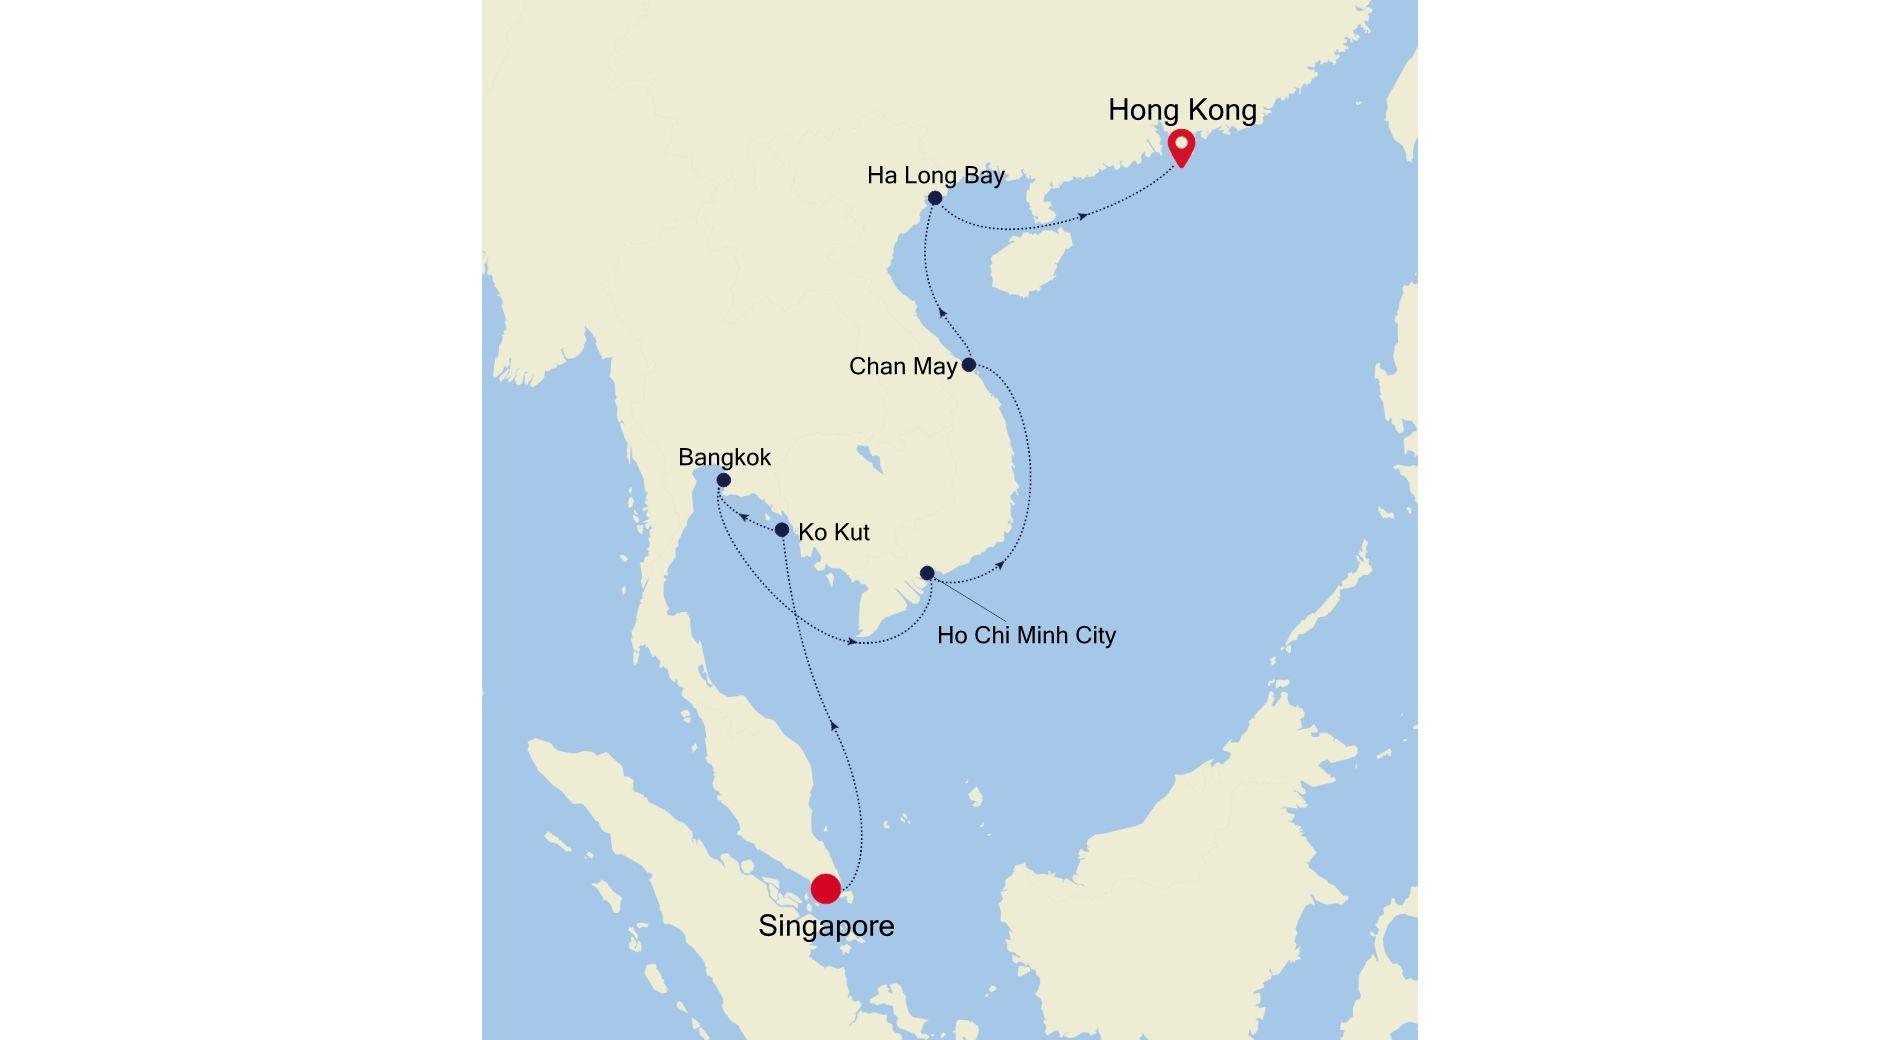 MO220105014 - Singapore to Hong Kong